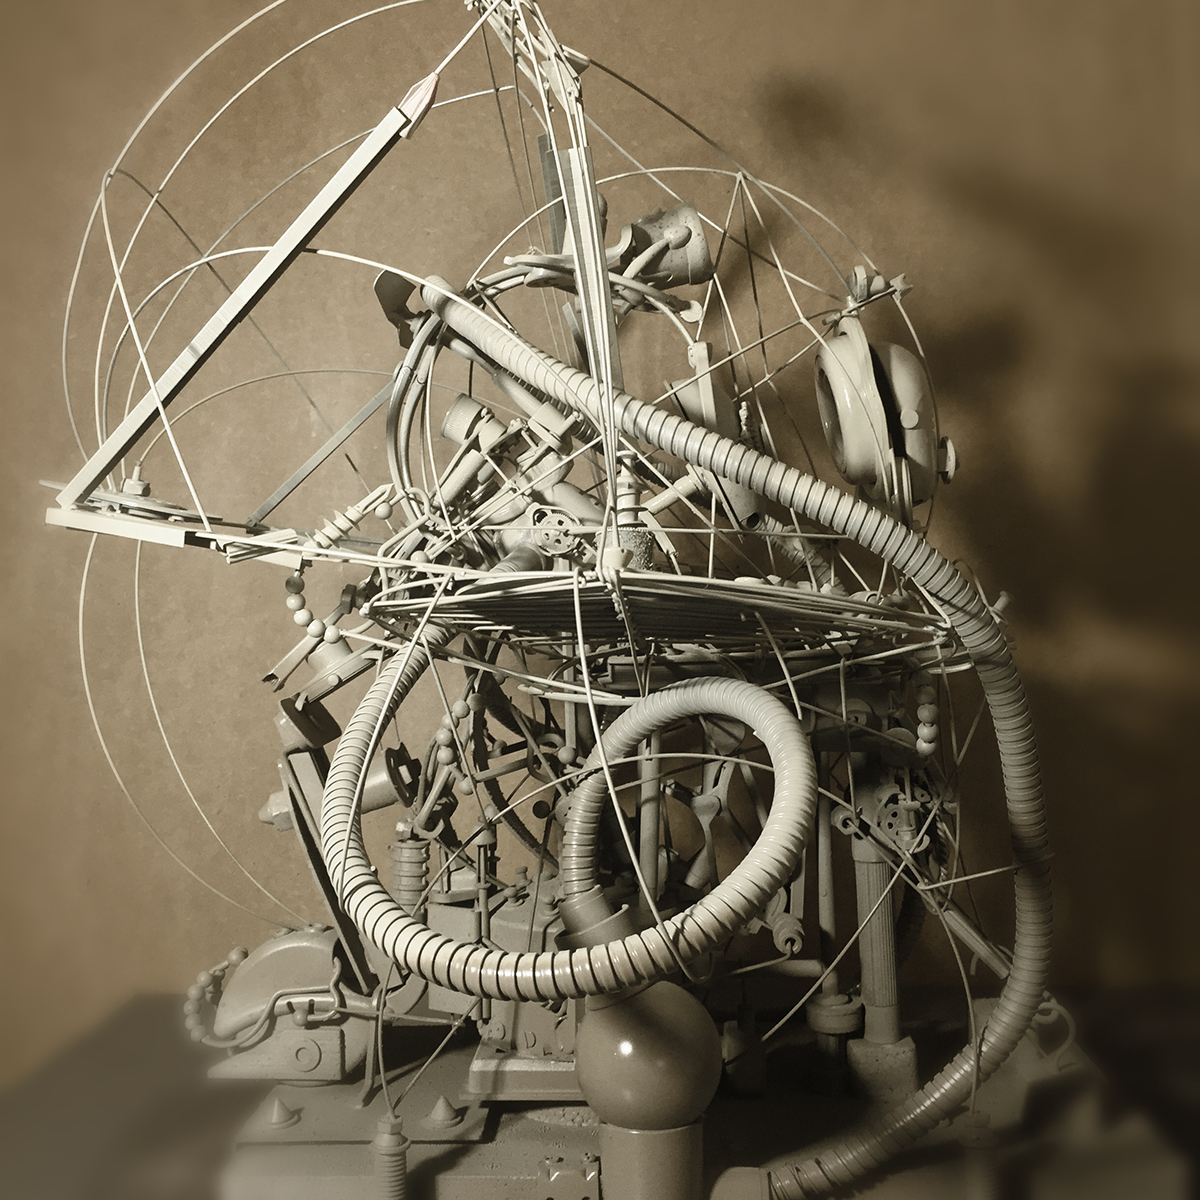 Cocoon Assemblage Art sculpture STEAMPUNK retro-futurism intricate Samuel Gomez samuelgomezart